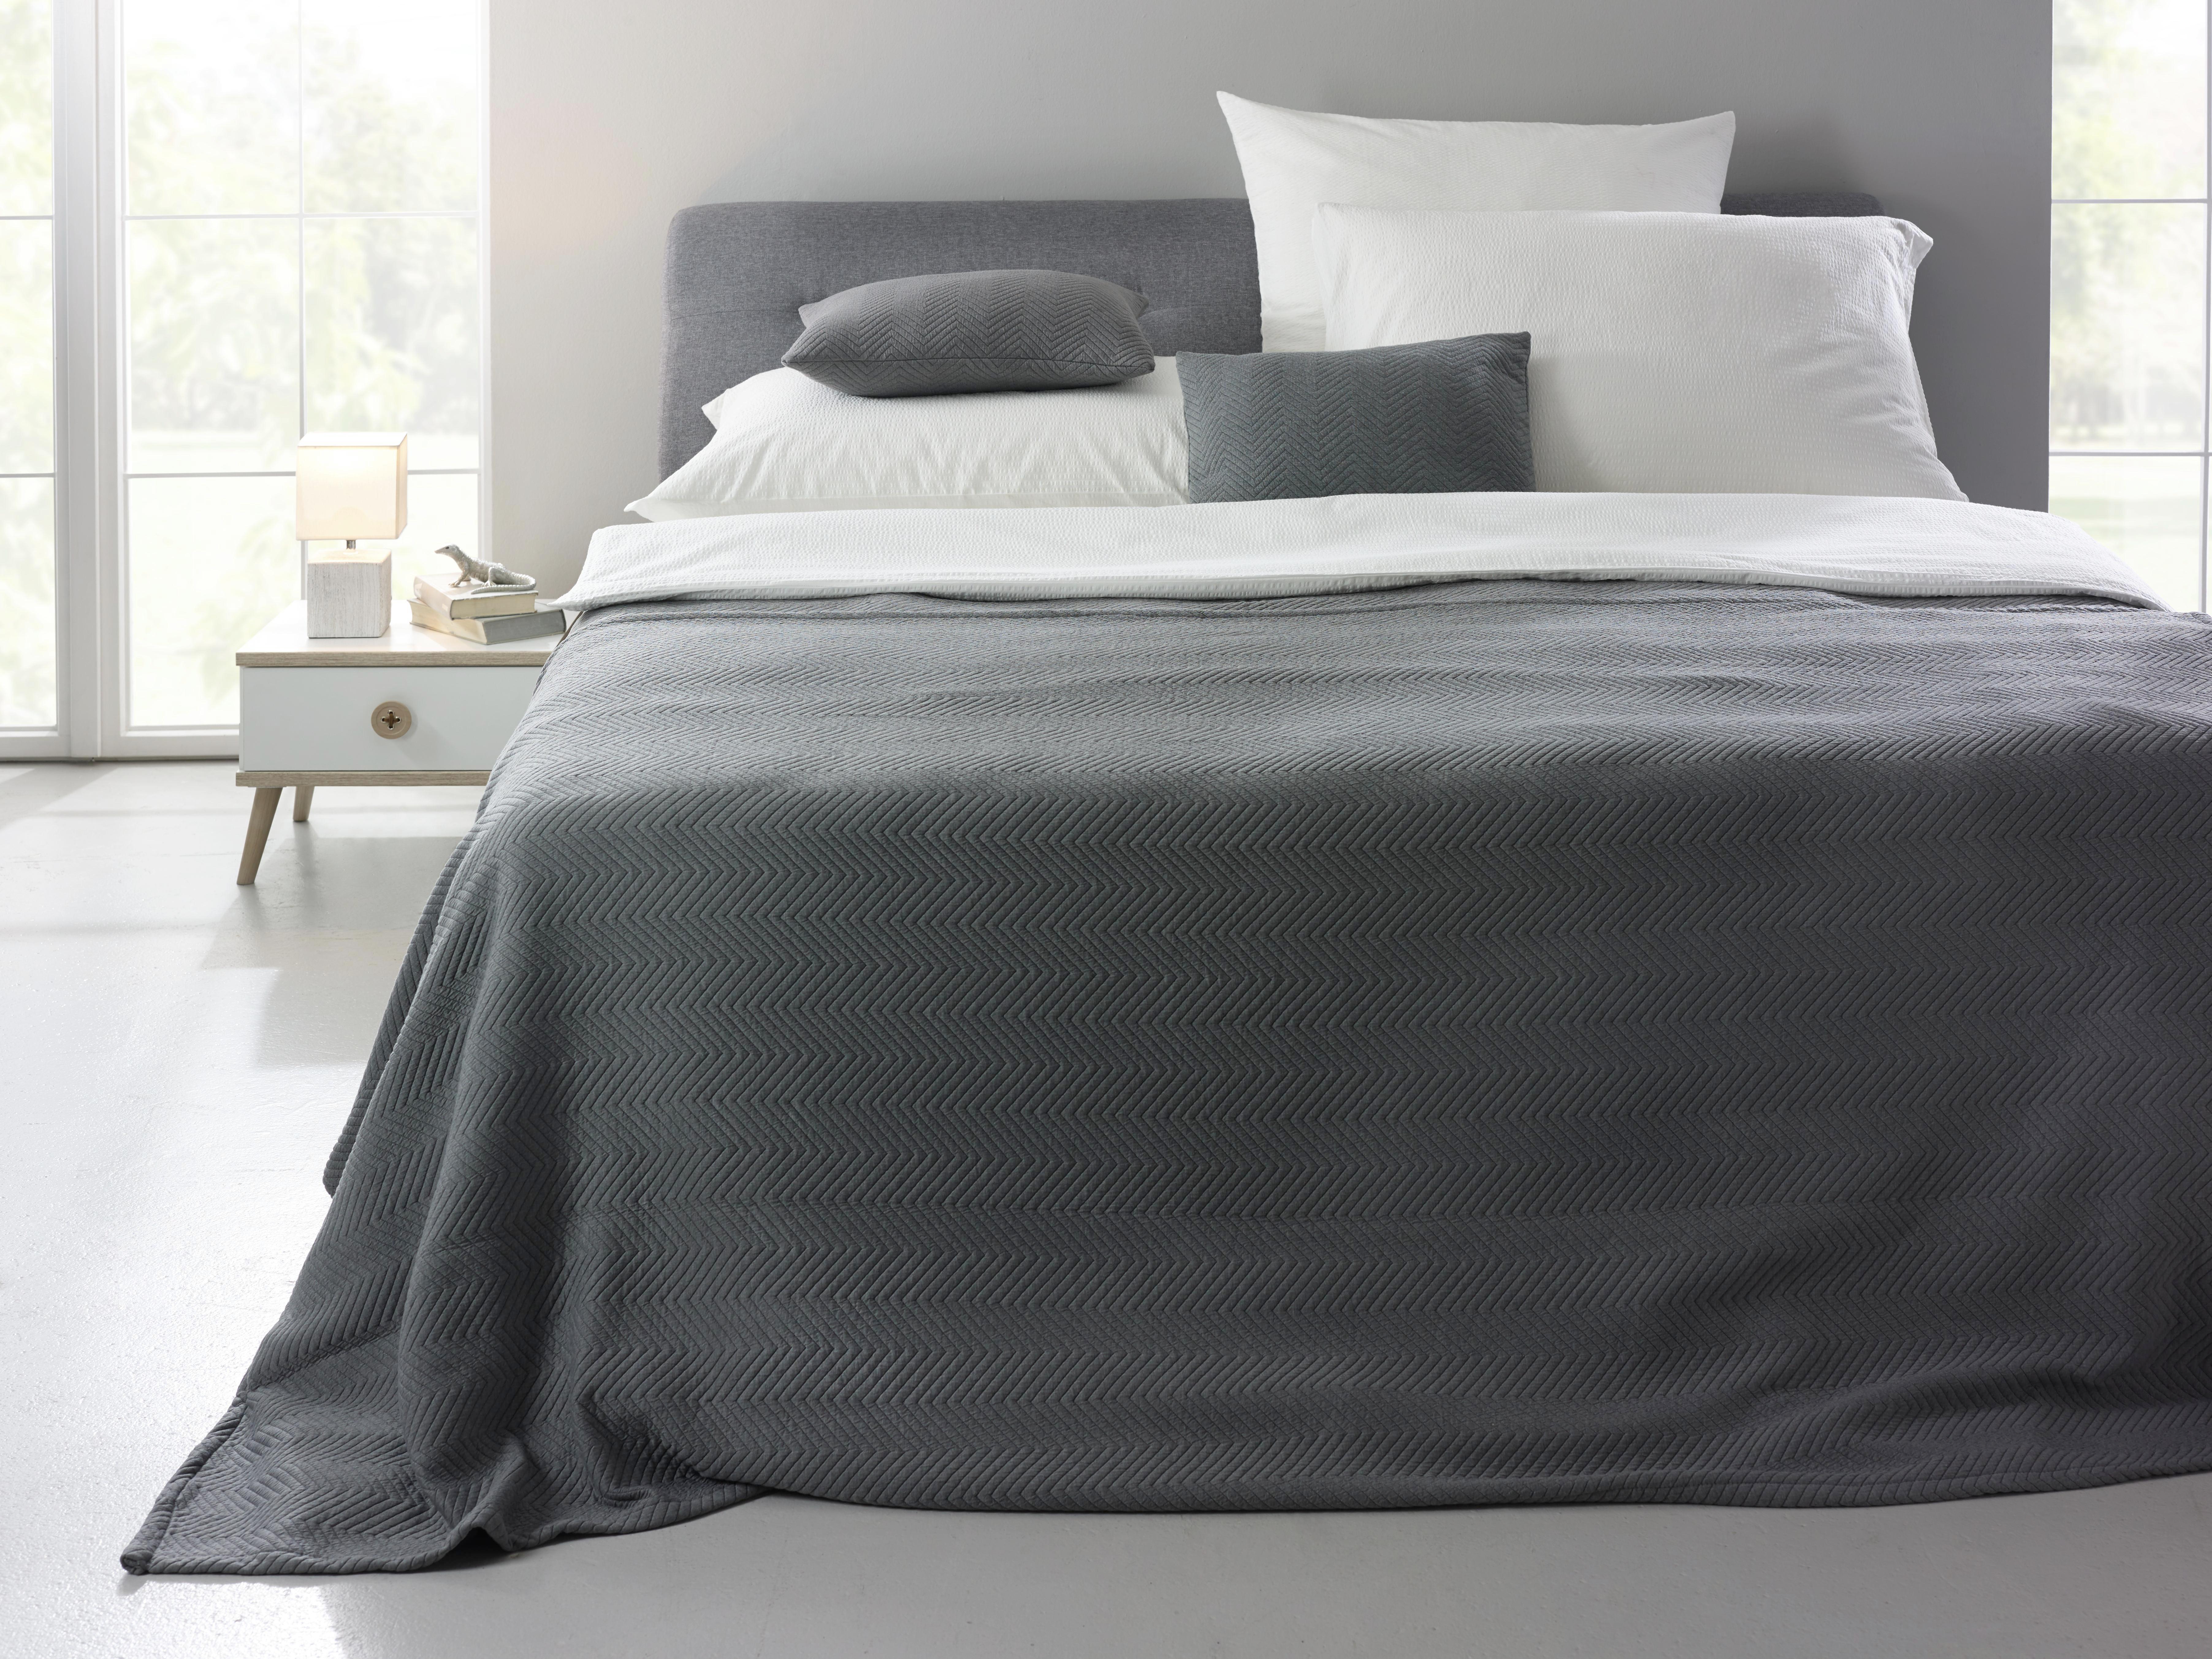 Tagesdecke Bilbao ca. 140x220 cm - Anthrazit, Textil (140/220cm) - MÖMAX modern living